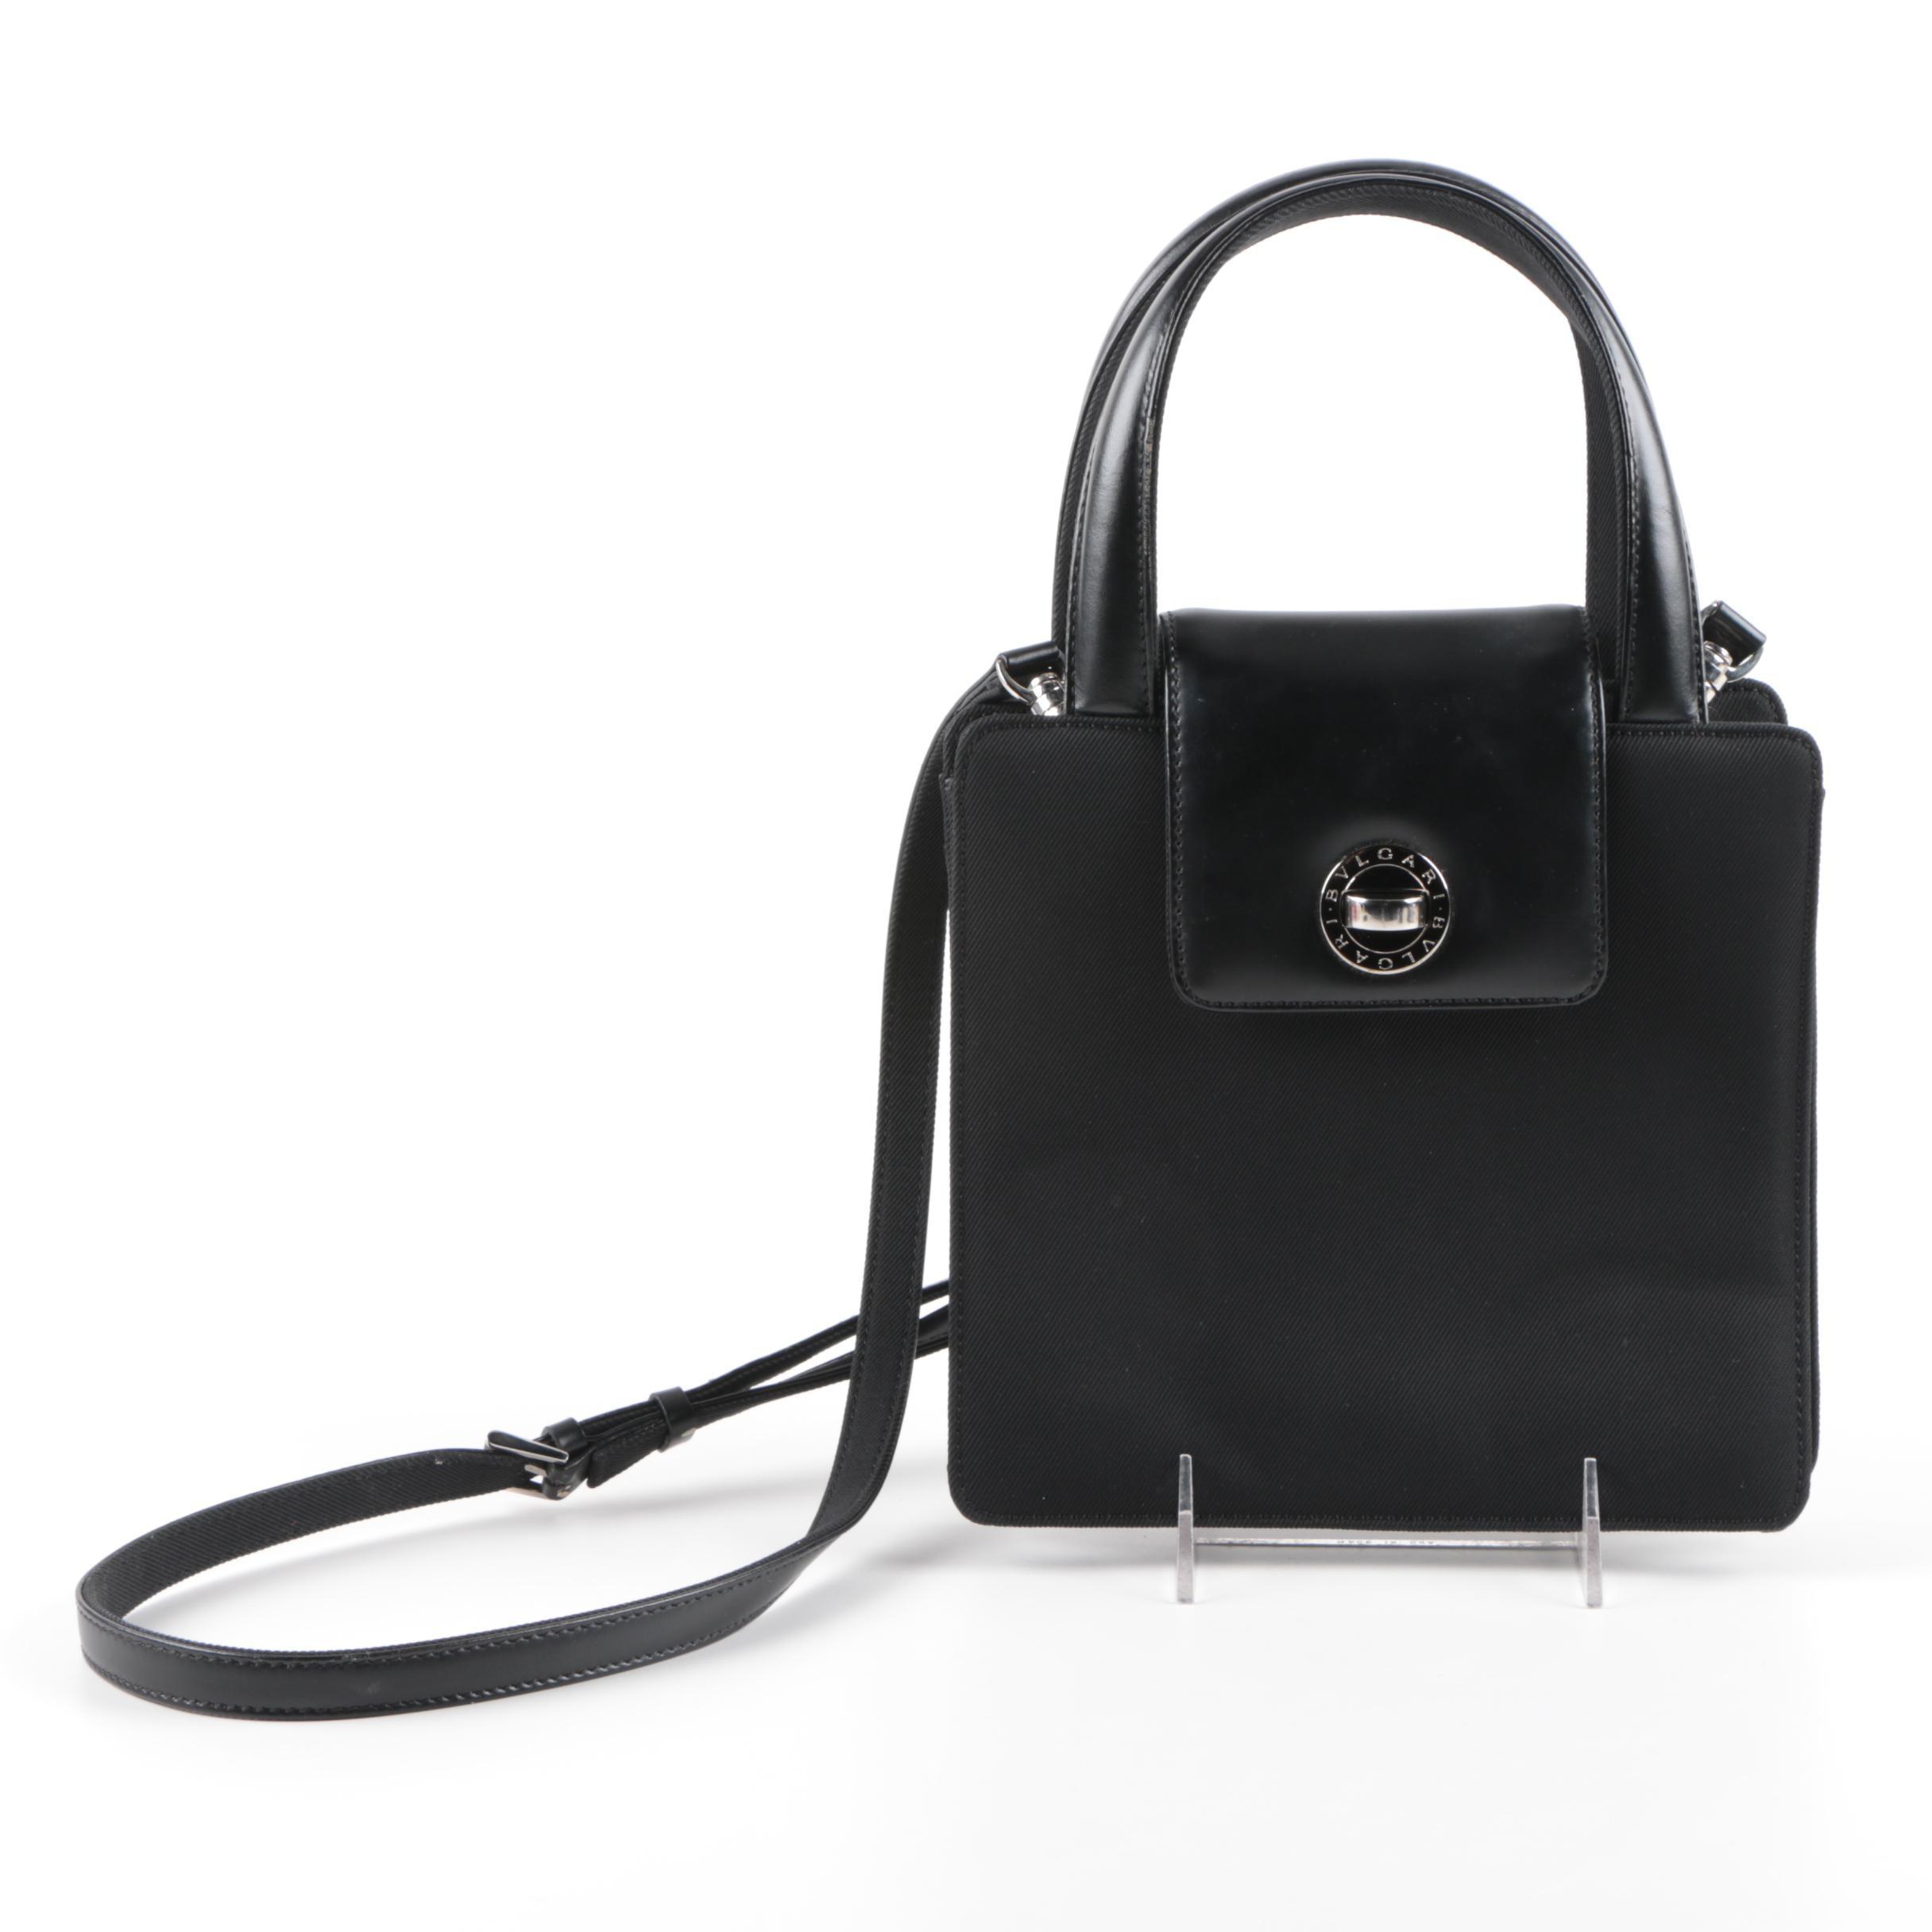 Bulgari Black Grosgrain and Leather Handbag